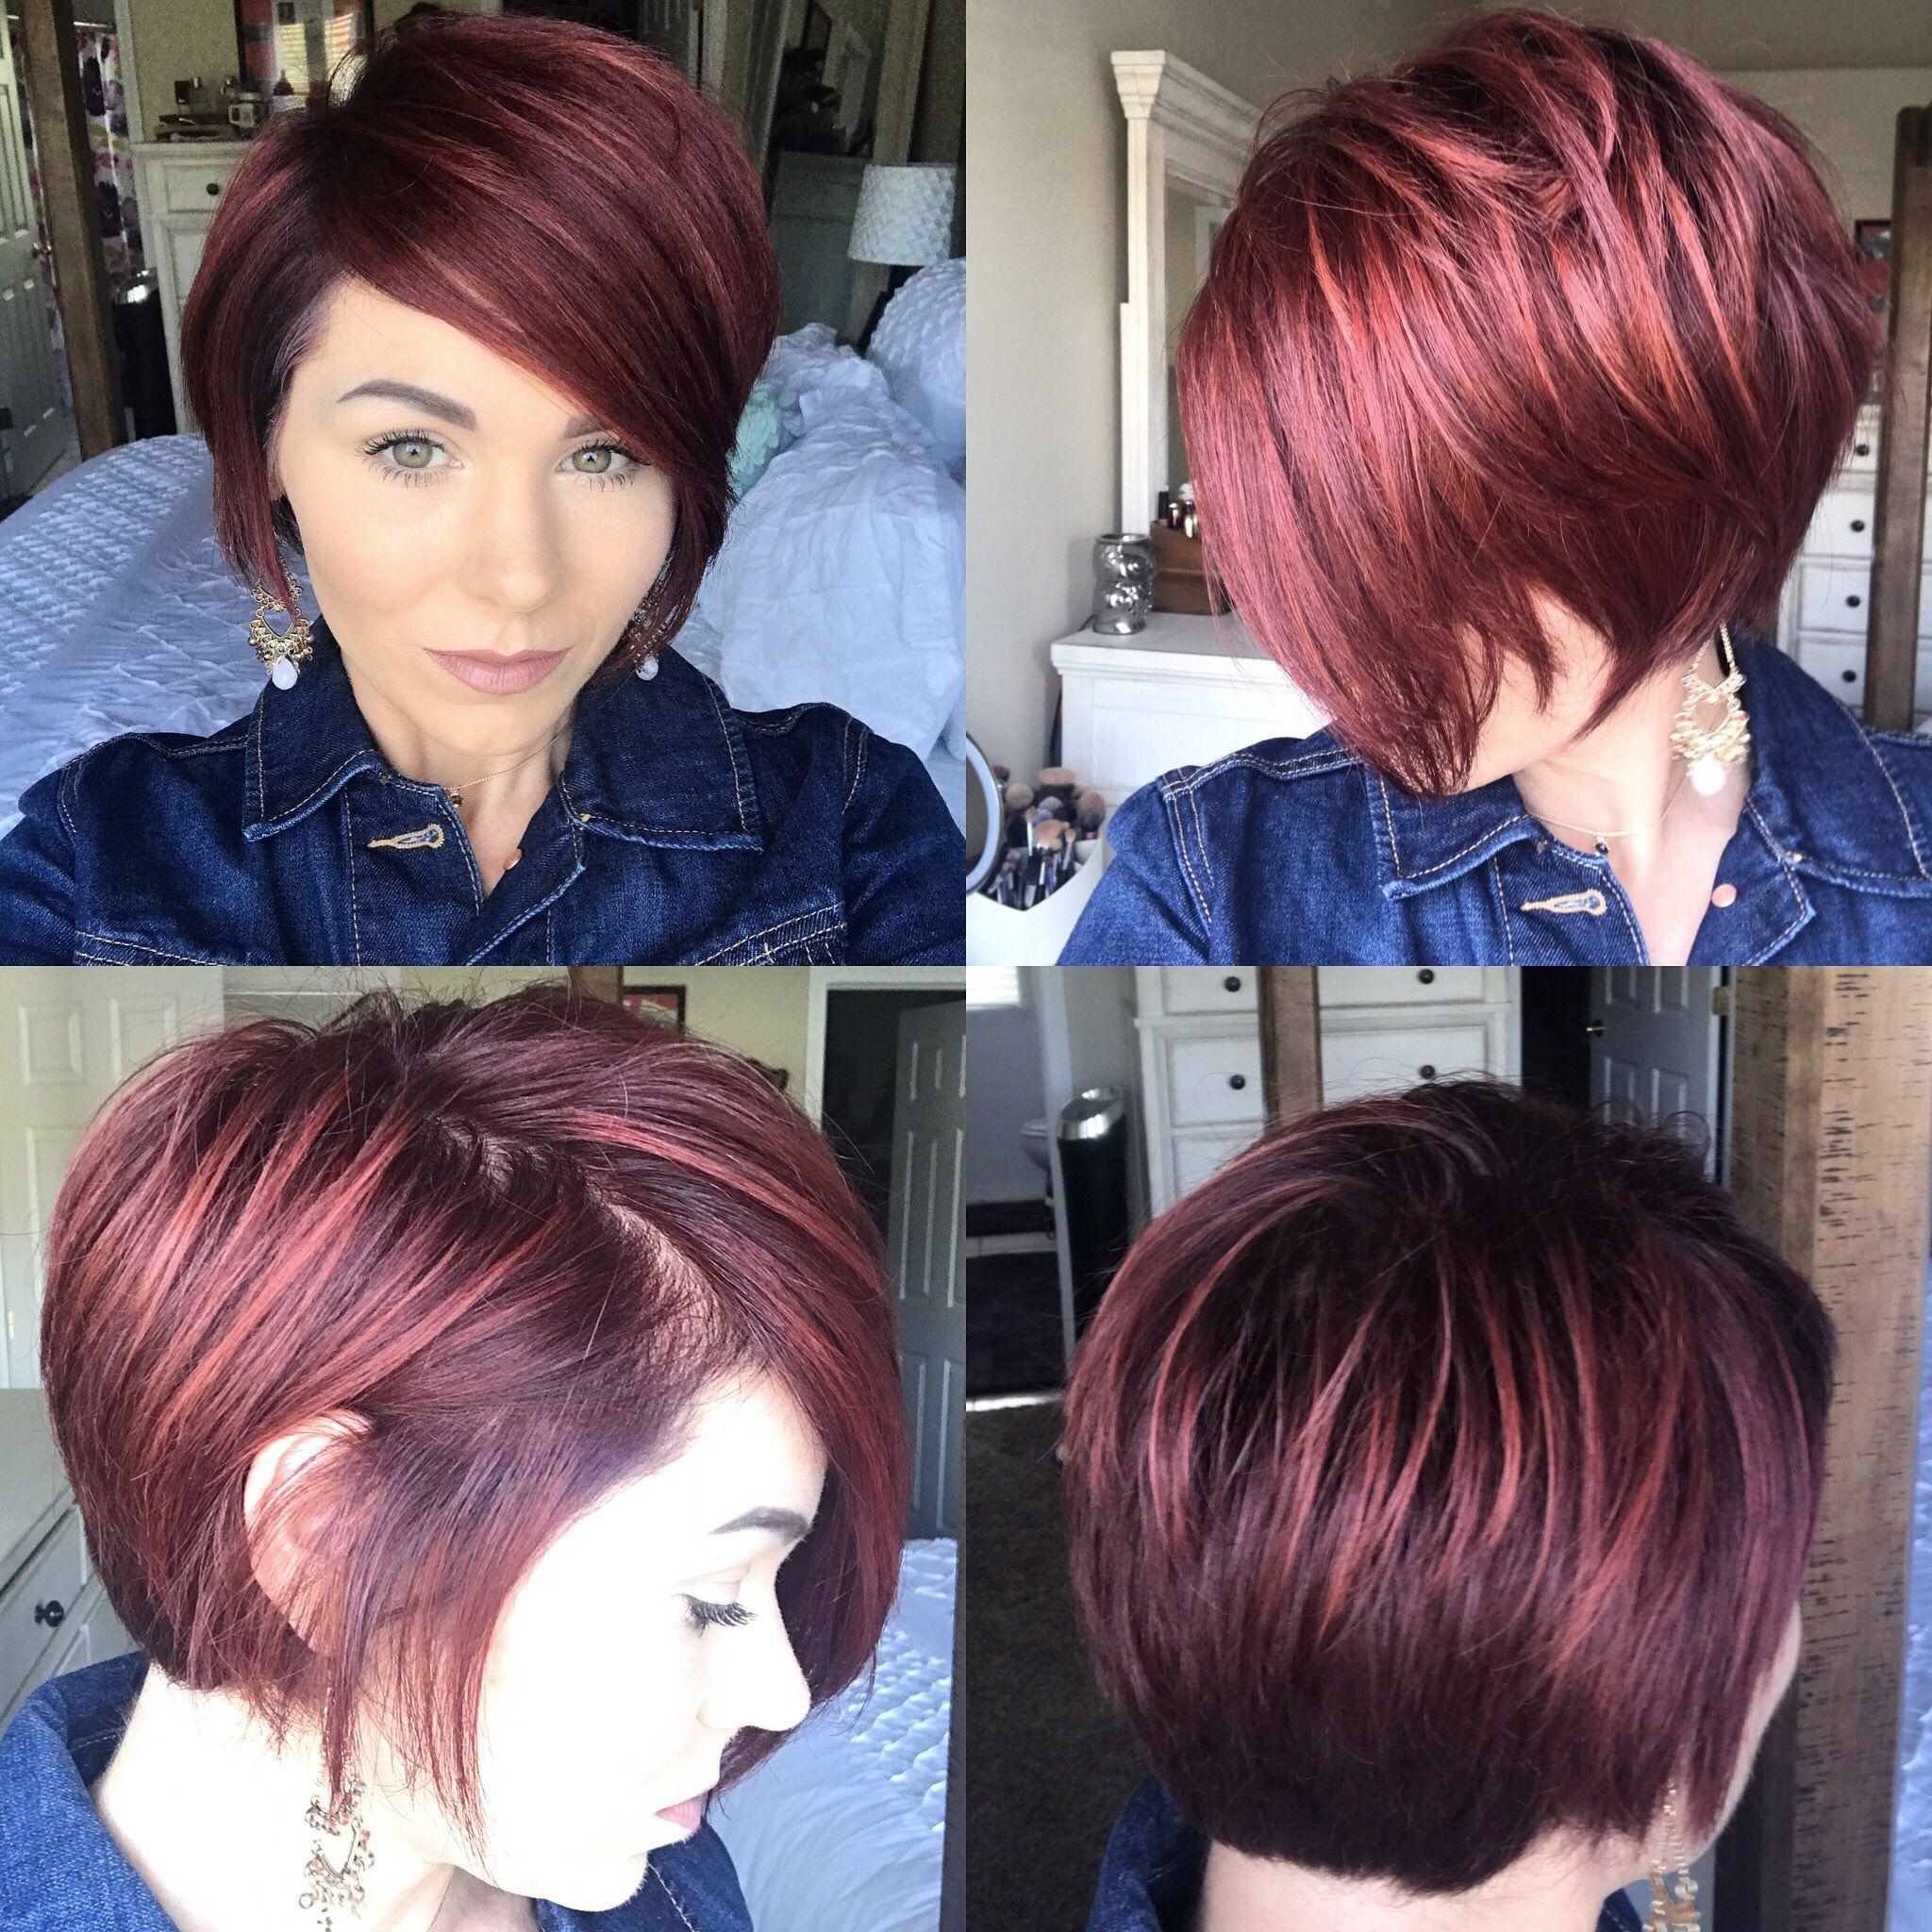 Pixie redhair redviolet shorthair bob shortbob bob